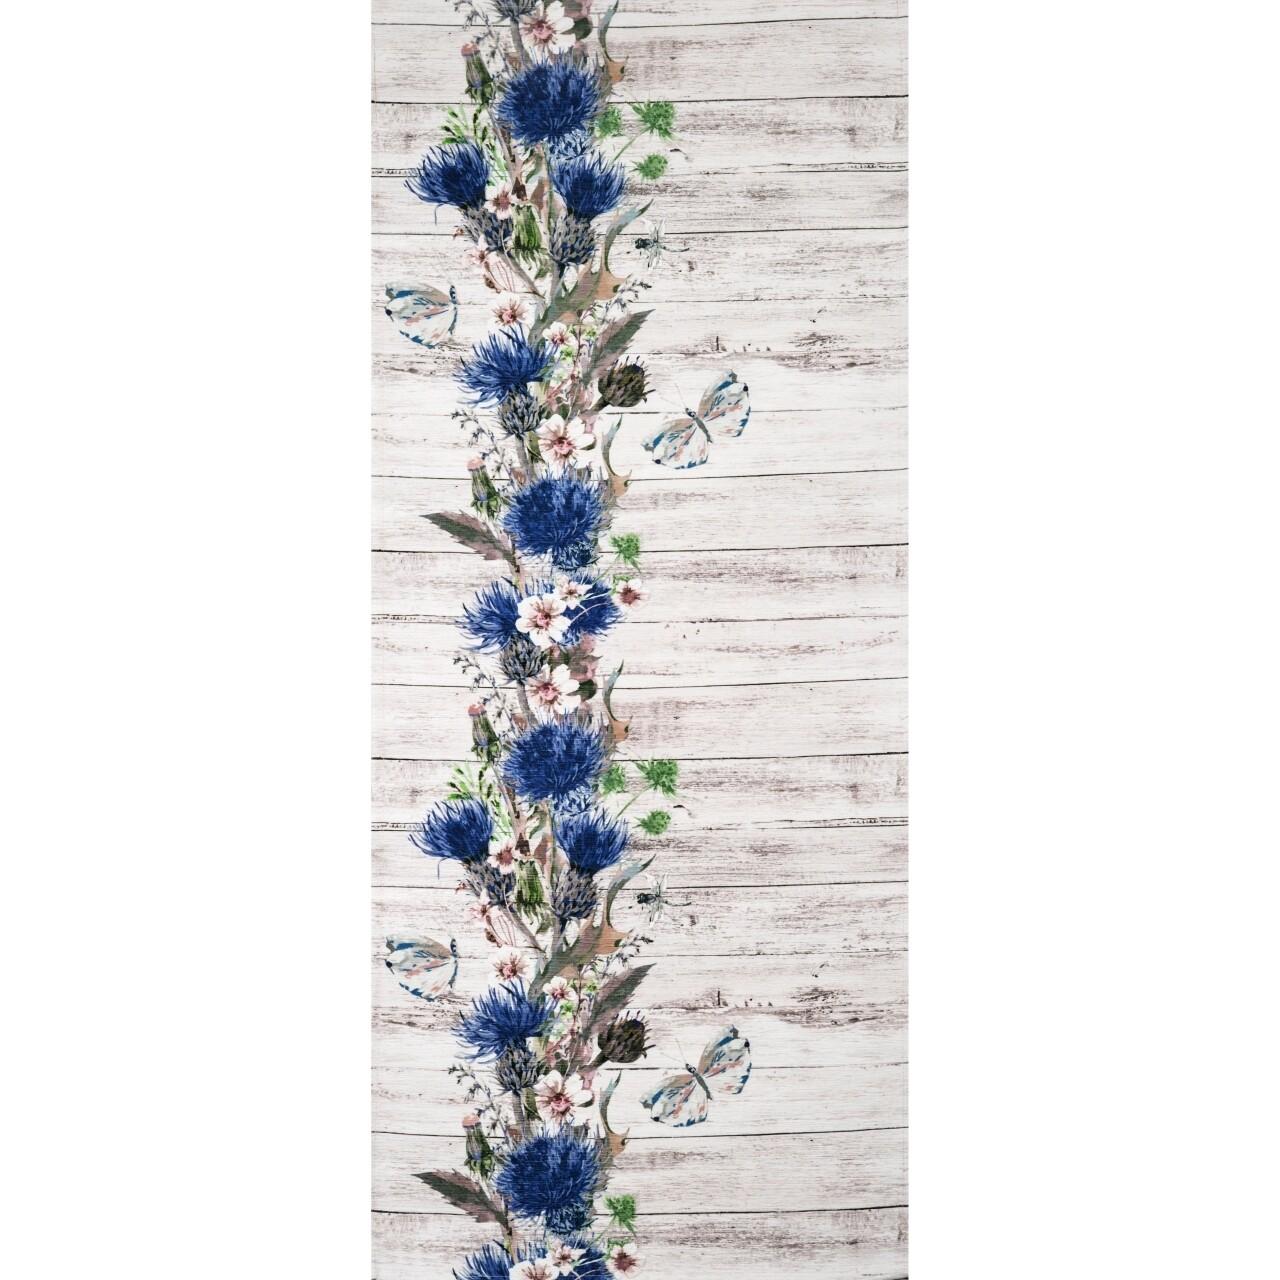 Covor rezistent Webtappeti Fiori Selvatici 58x140 cm, multicolor